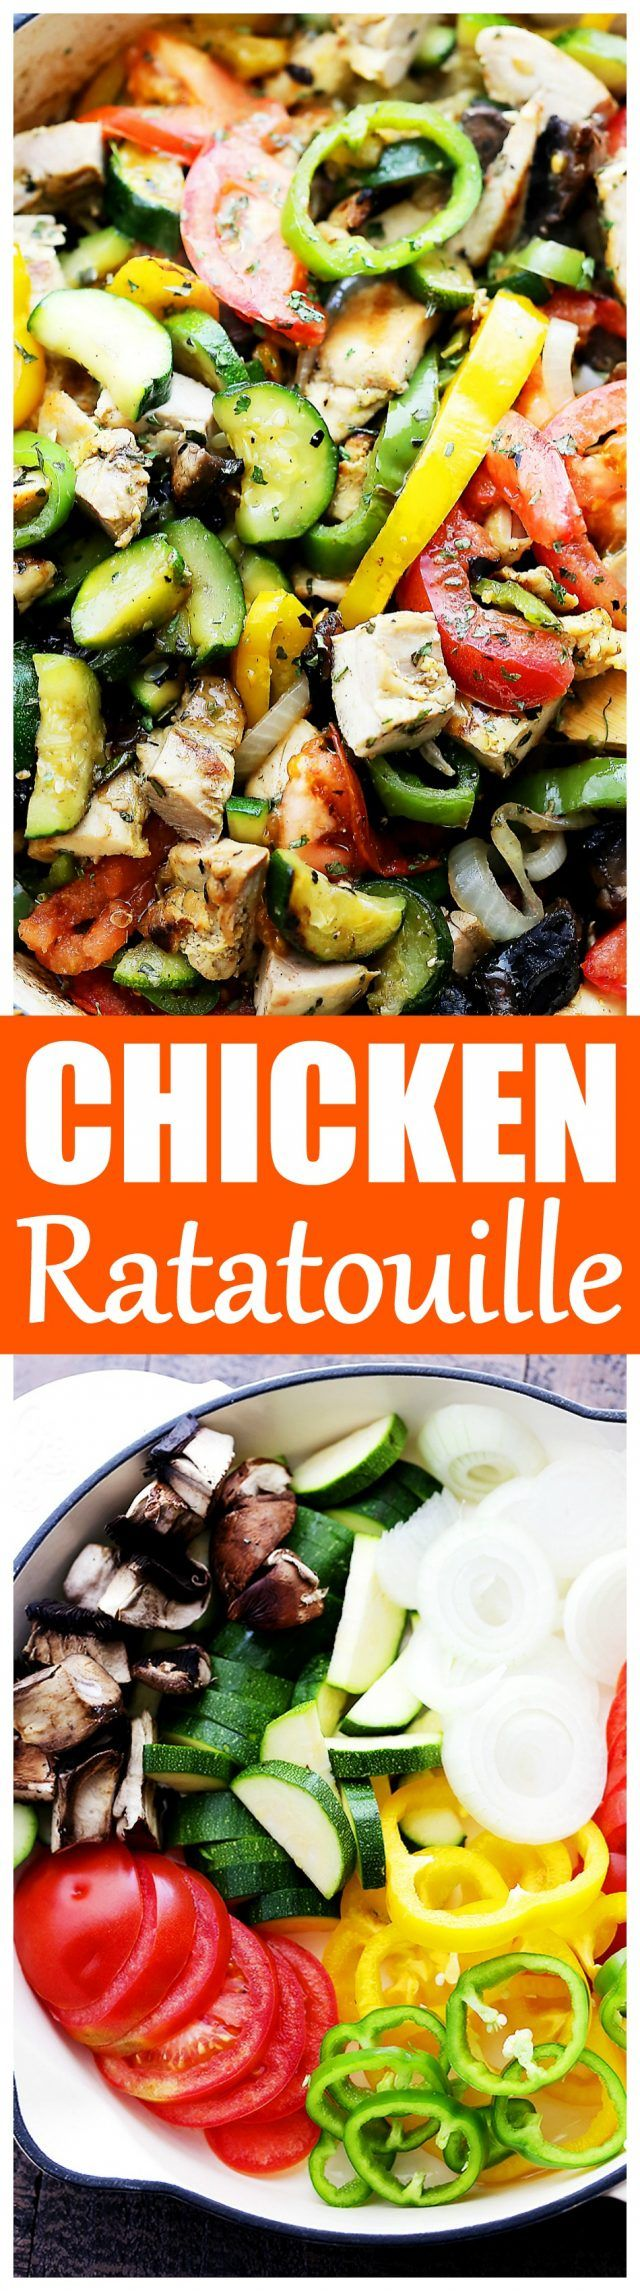 Chicken Ratatouille